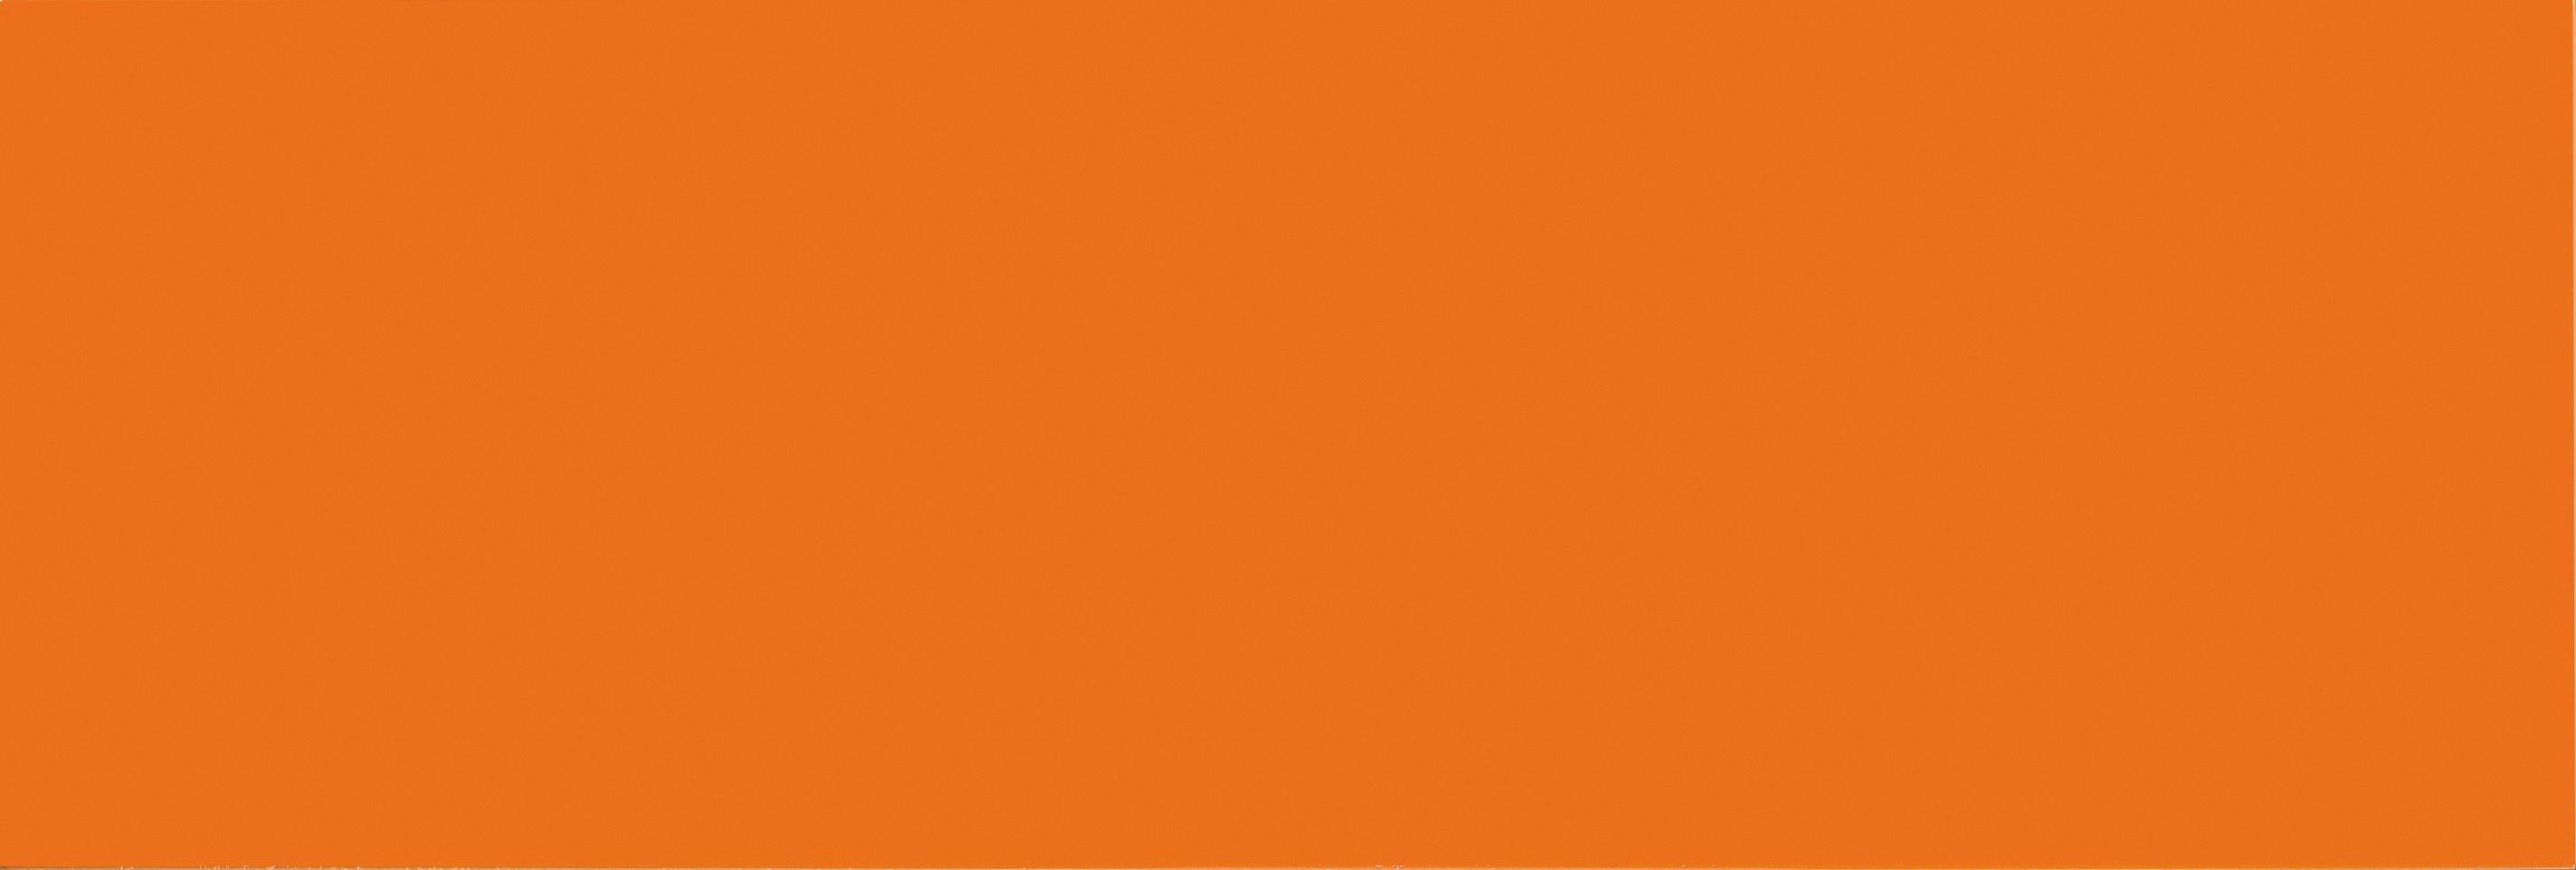 The Best And Most Comprehensive Sfondo Arancione Fluo Tinta